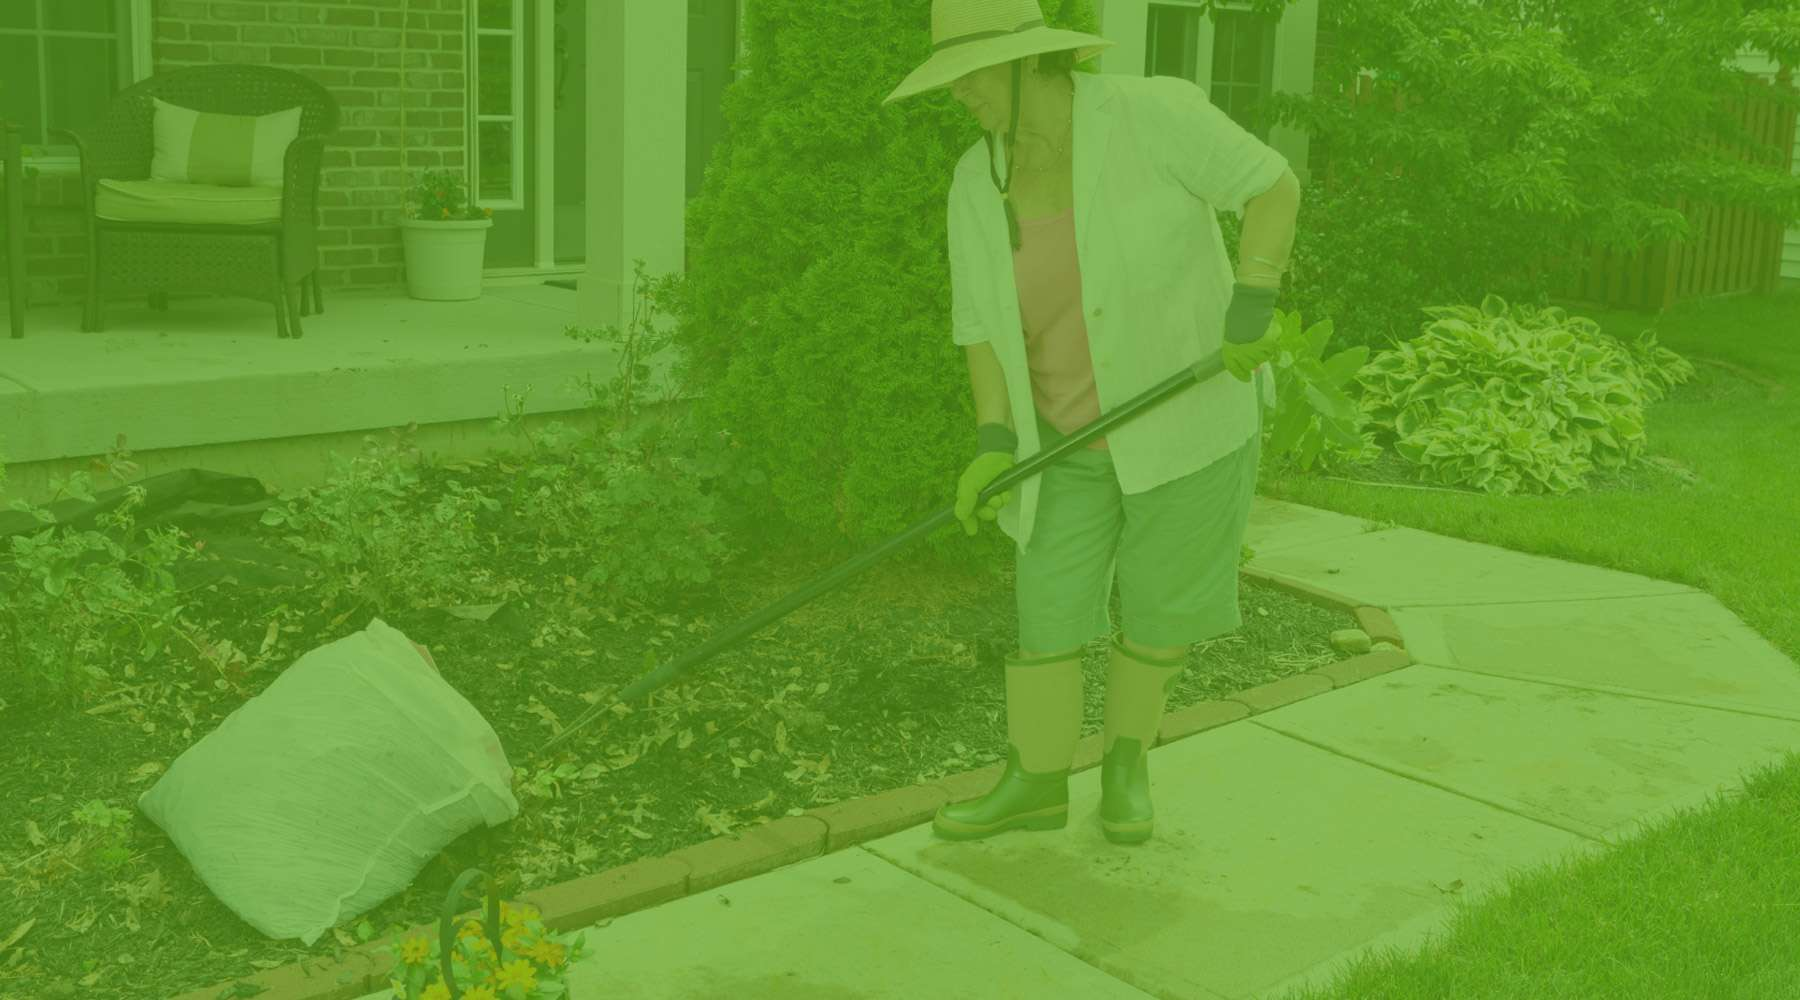 garden-center-marketing-websites-bg